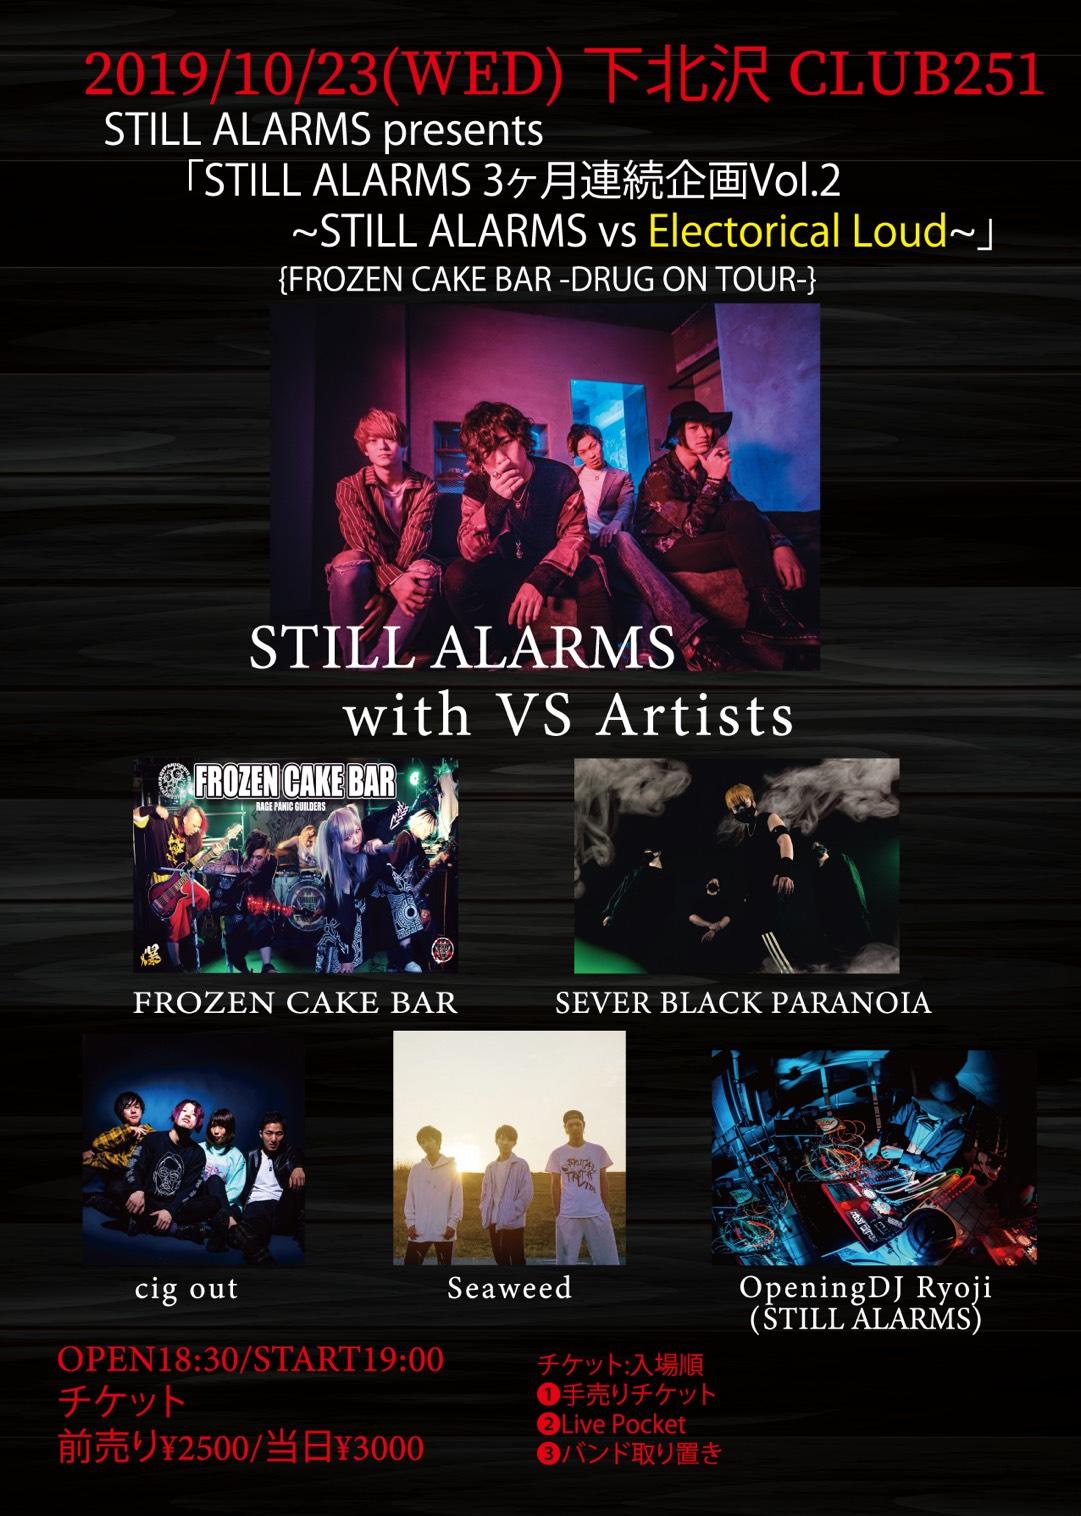 「STILL ALARMS 3ヶ月連続企画Vol.2 ~STILL ALARMS vs Electorical Loud~」